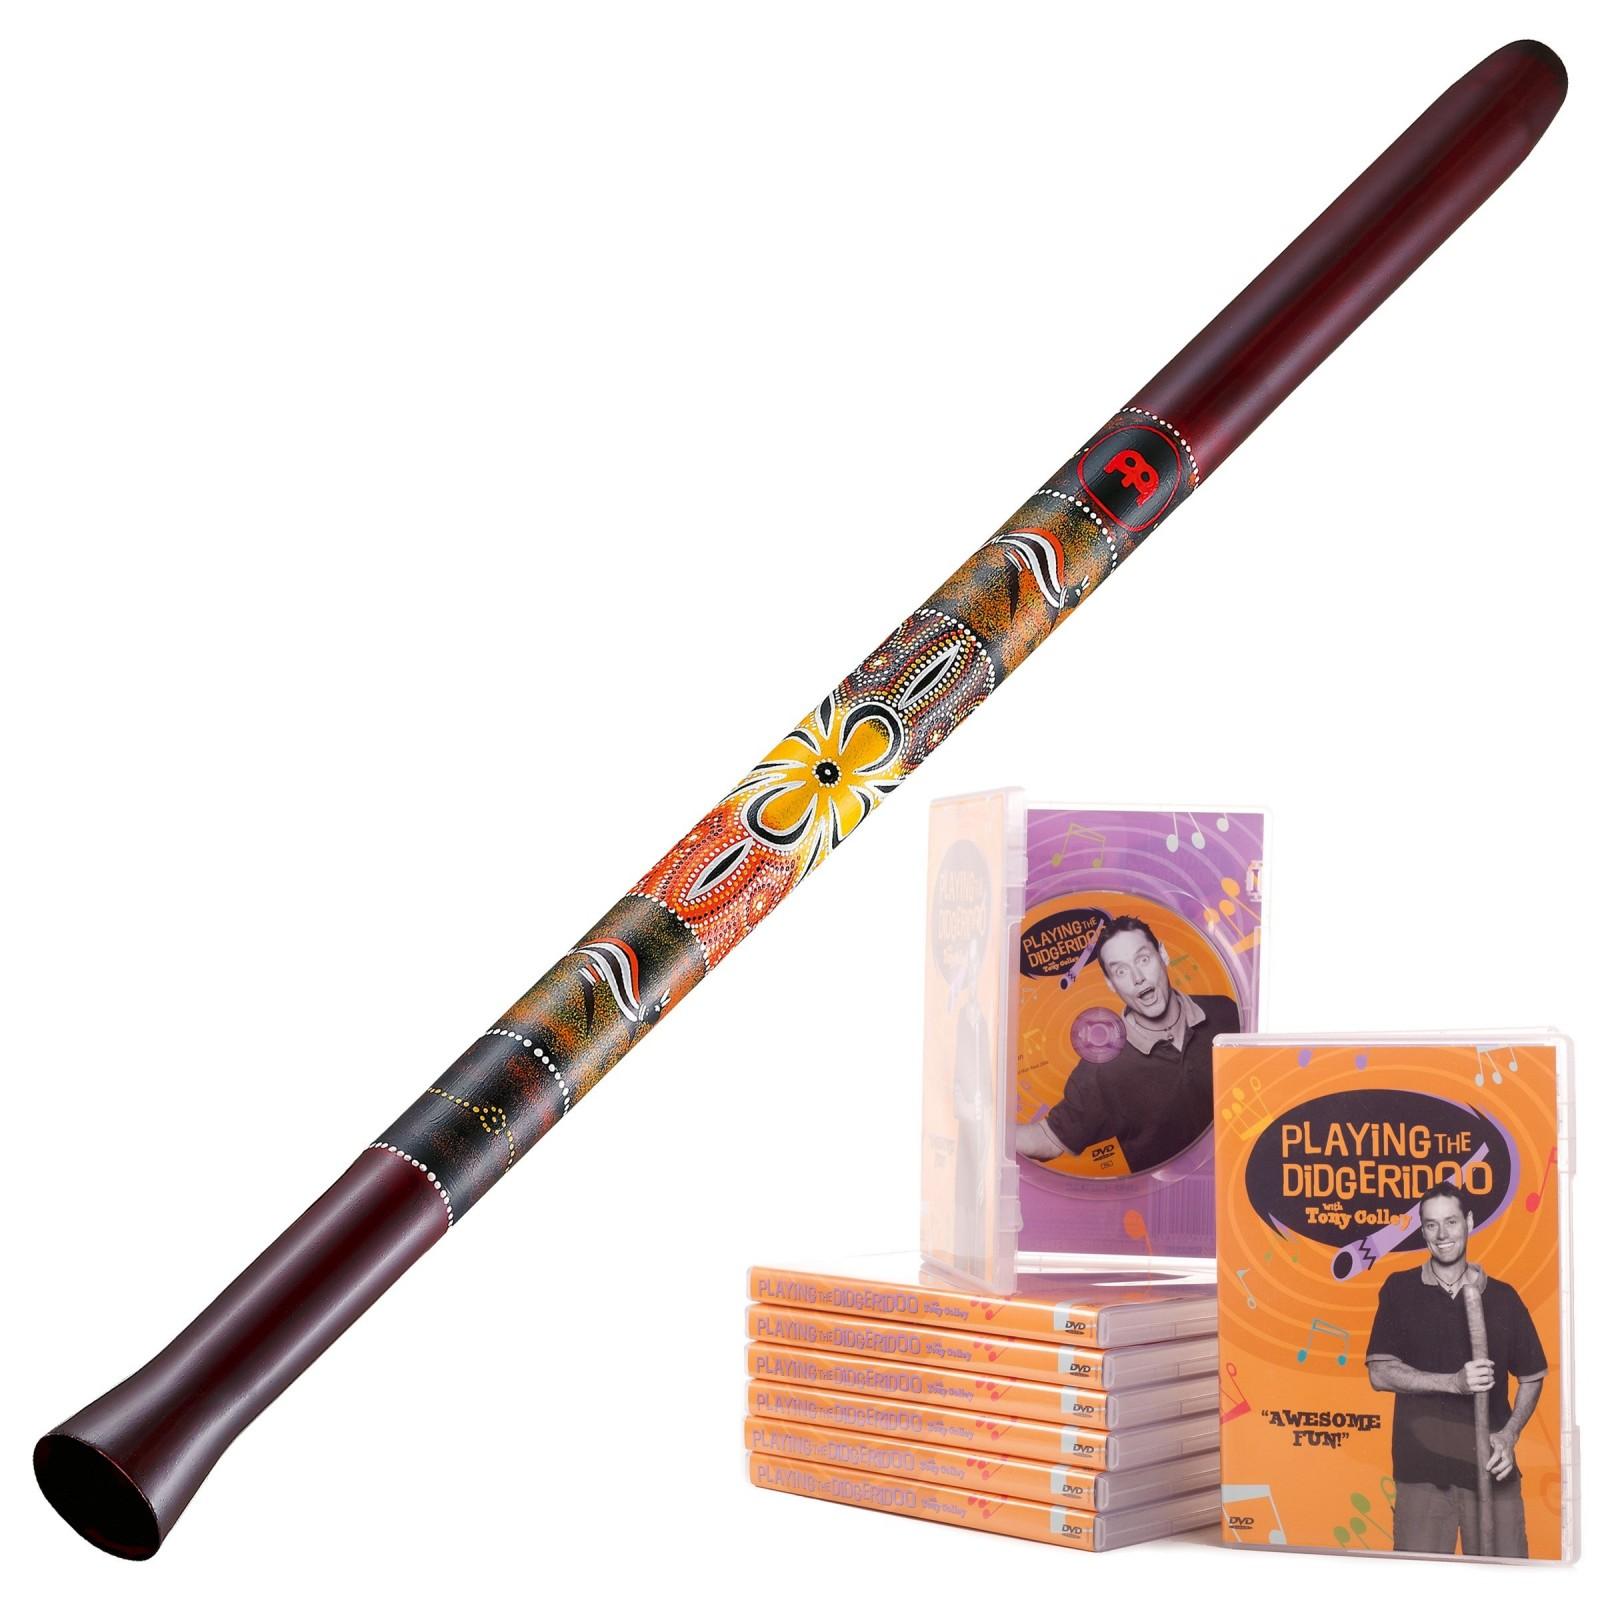 Meinl Didgeridoo  SDDG1-R pvc + instructie DVD